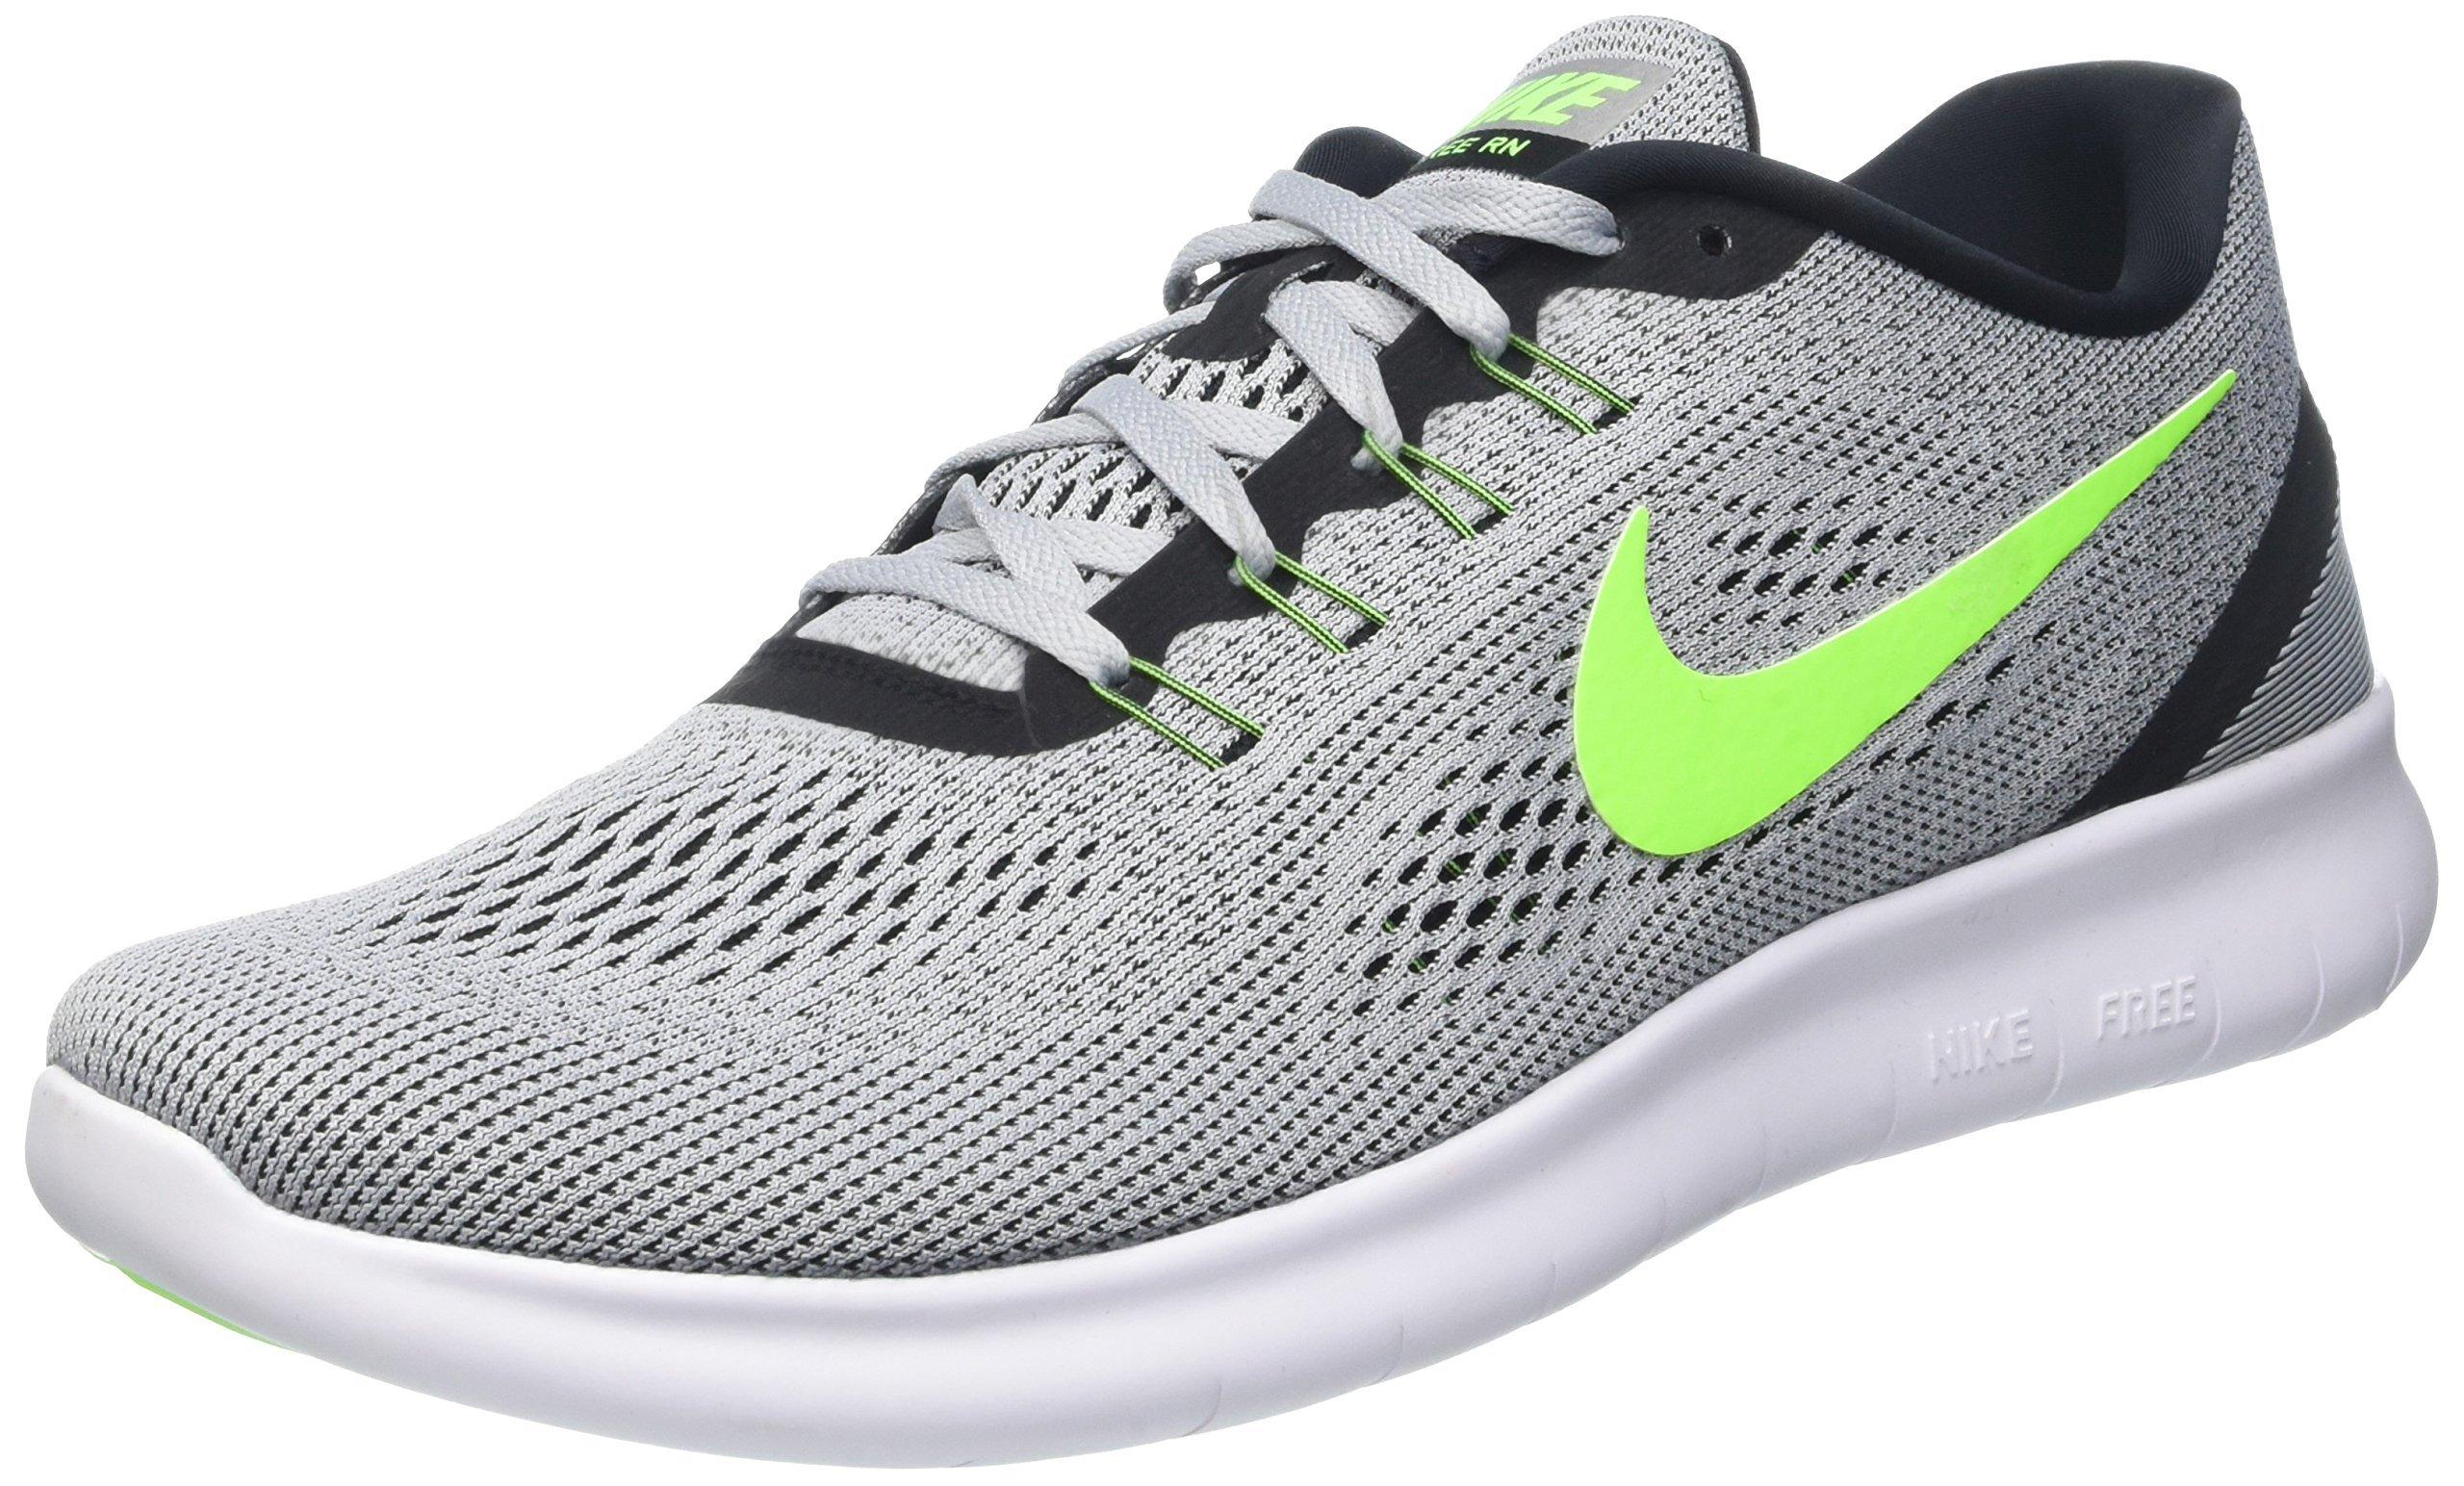 Nike Mens Free Rn Pure Platinum/Elctrc Grn/Anthracite Running Shoe 8 Men US by Nike (Image #1)